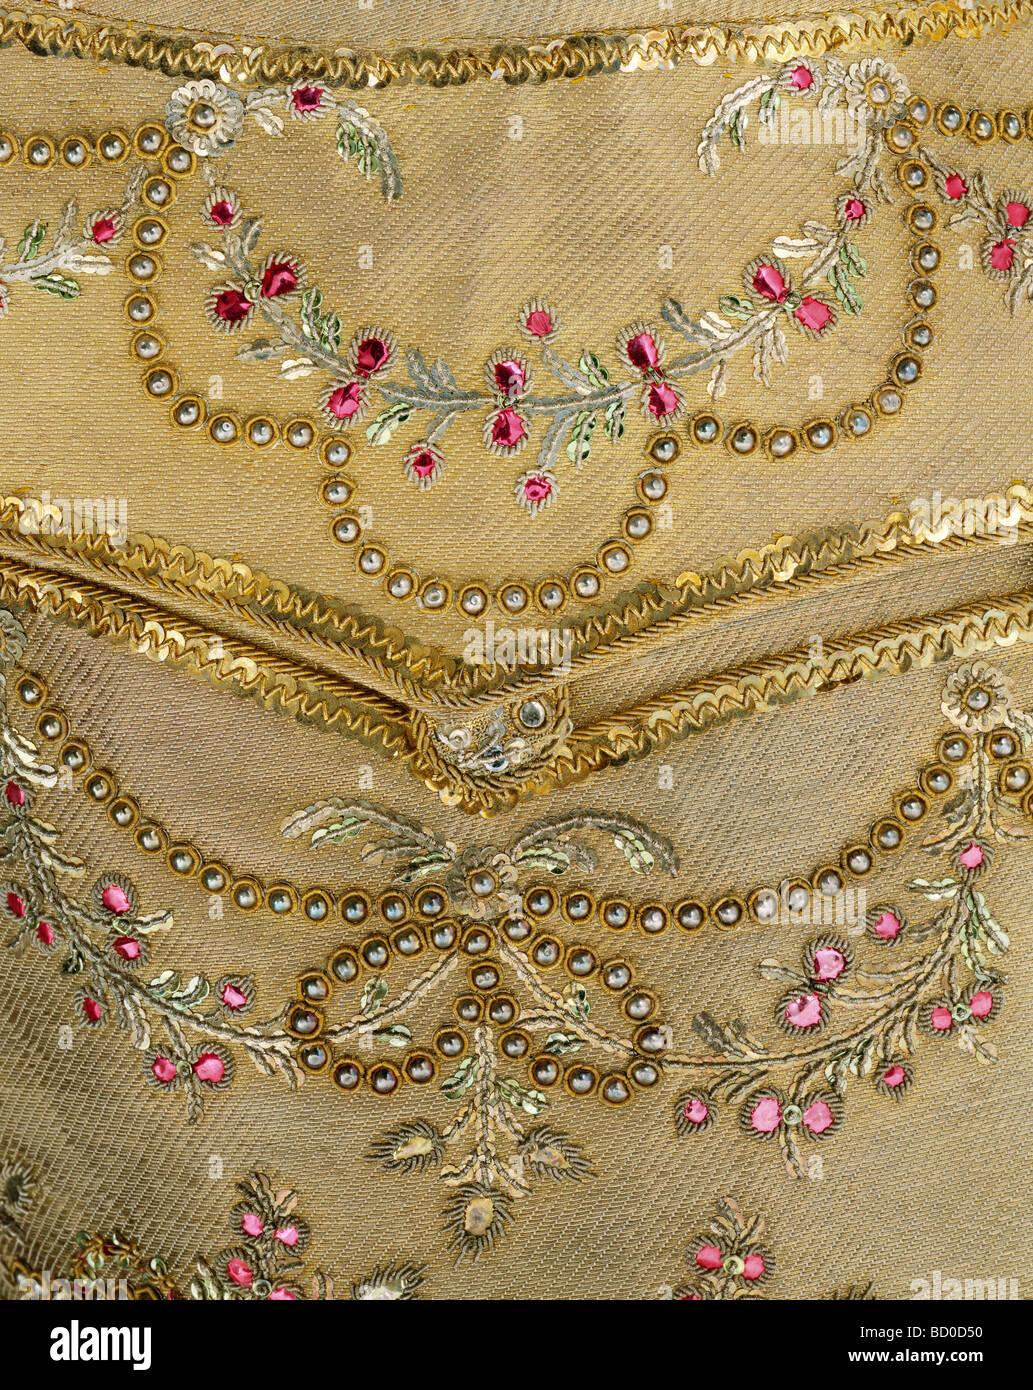 Waistcoat, detail. England, late 18th century - Stock Image